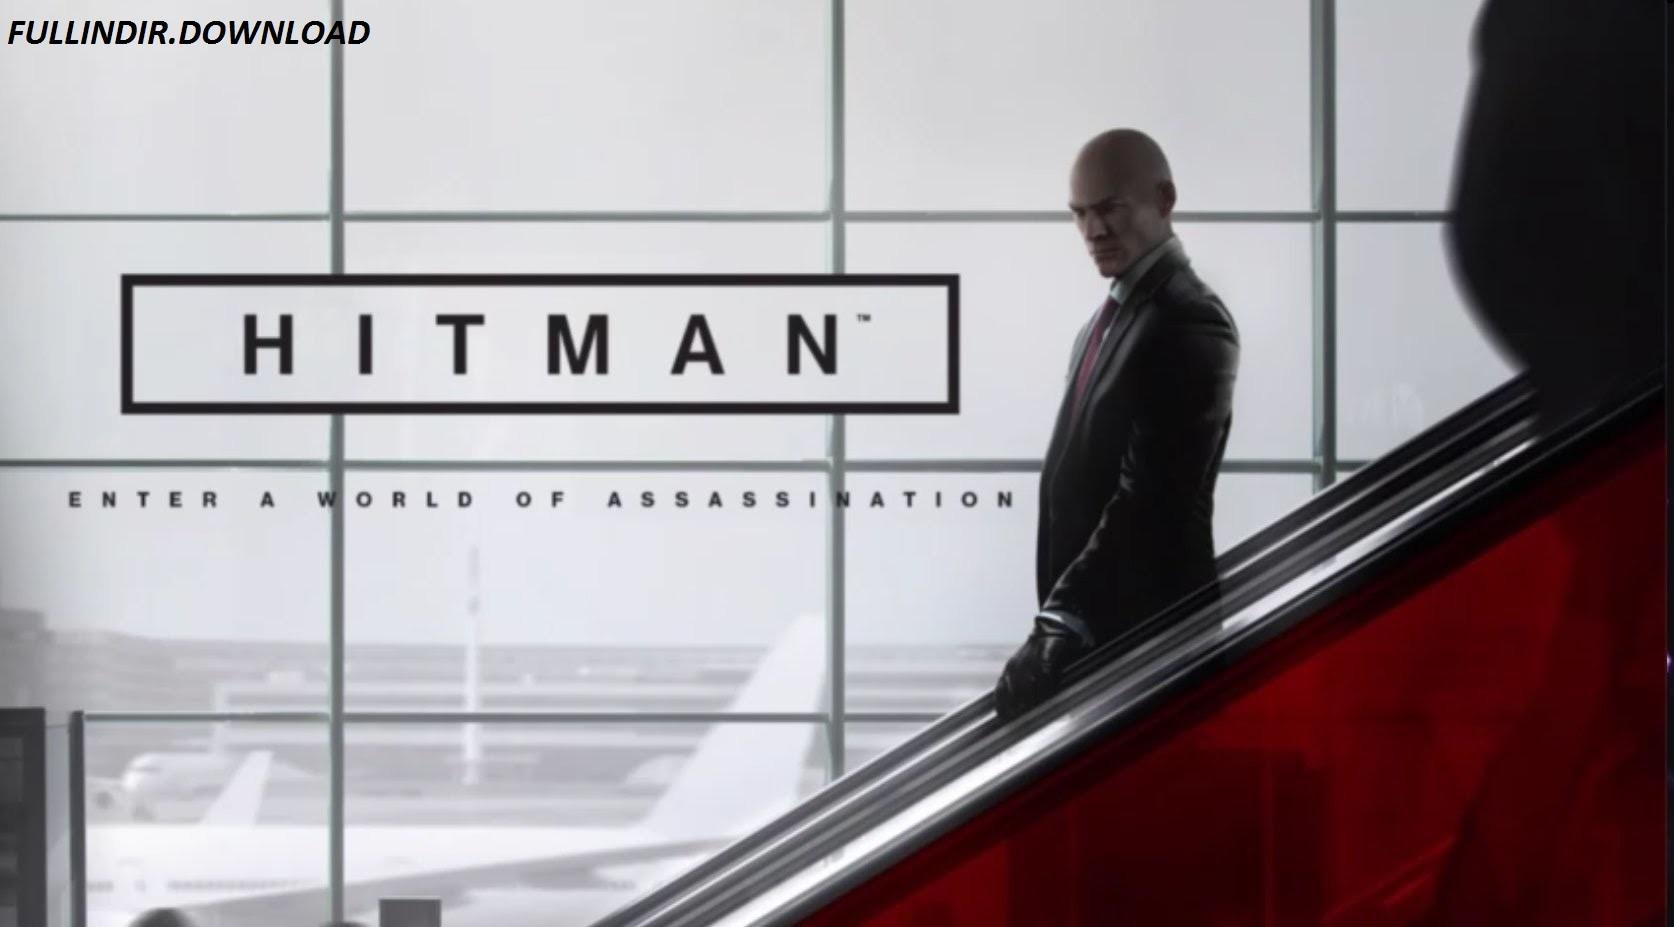 Hitman Enter a World of Assassination Full Torrent indir